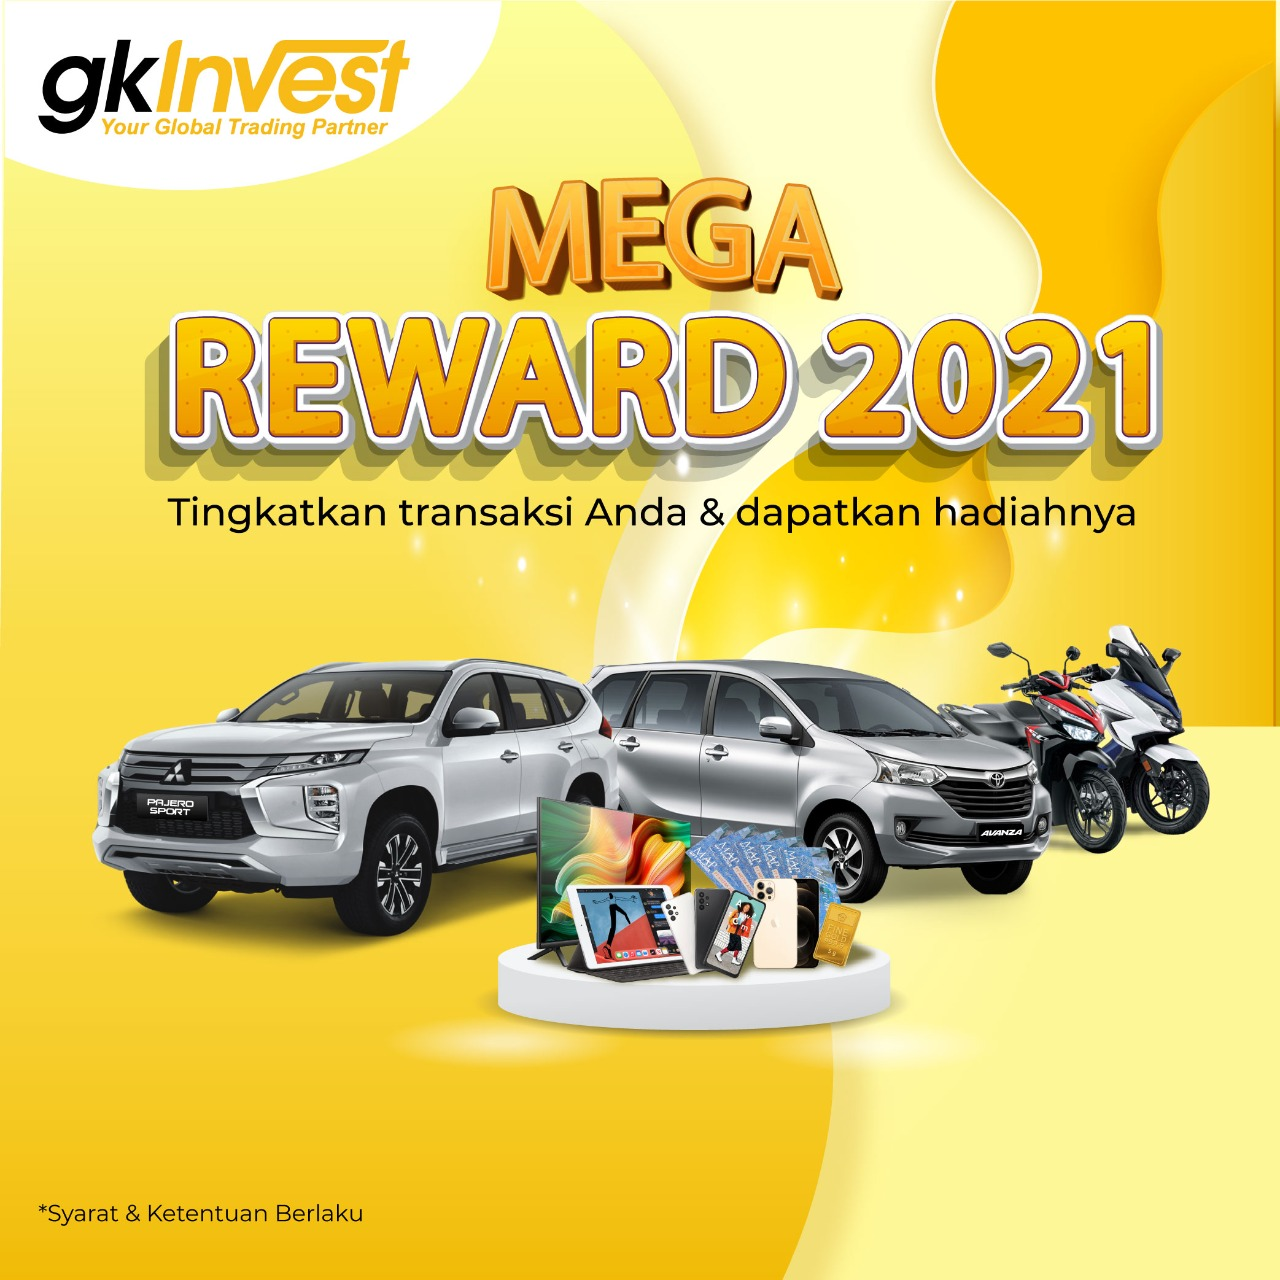 2 Mega Reward 2021 - GKInvest